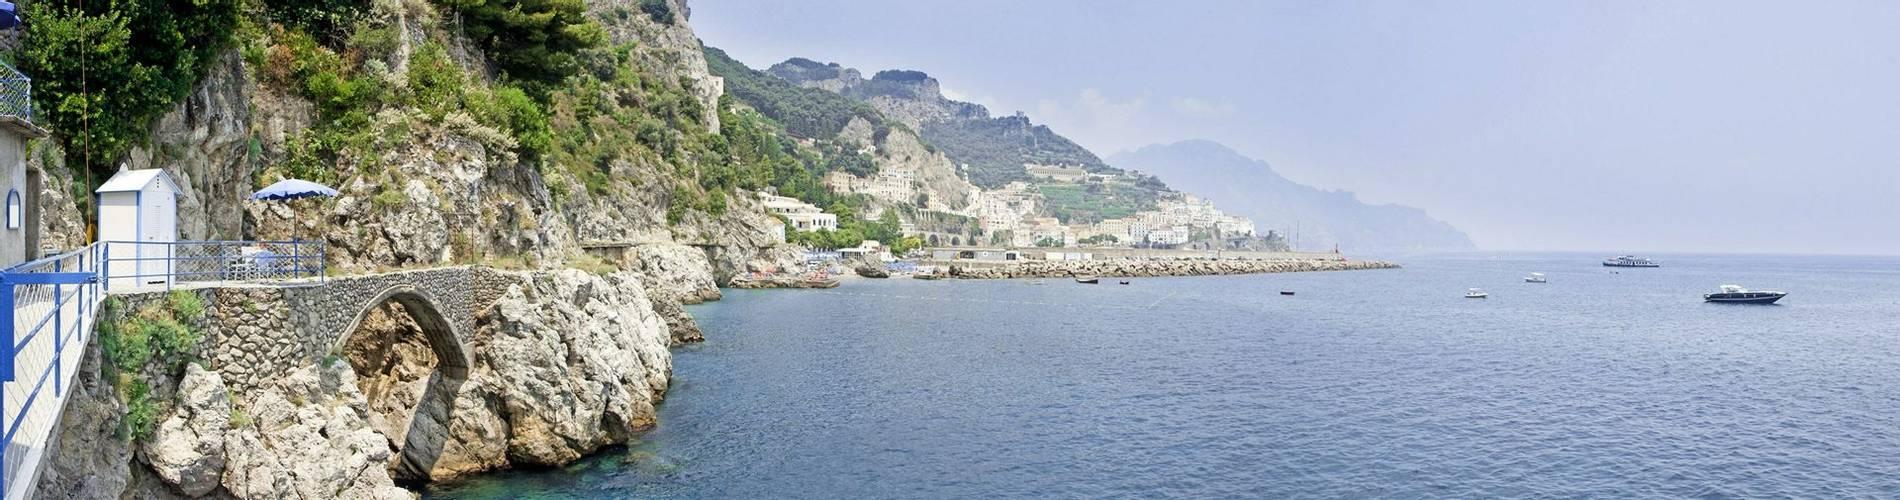 Miramalfi, Amalfi Coast, Italy (40).jpg